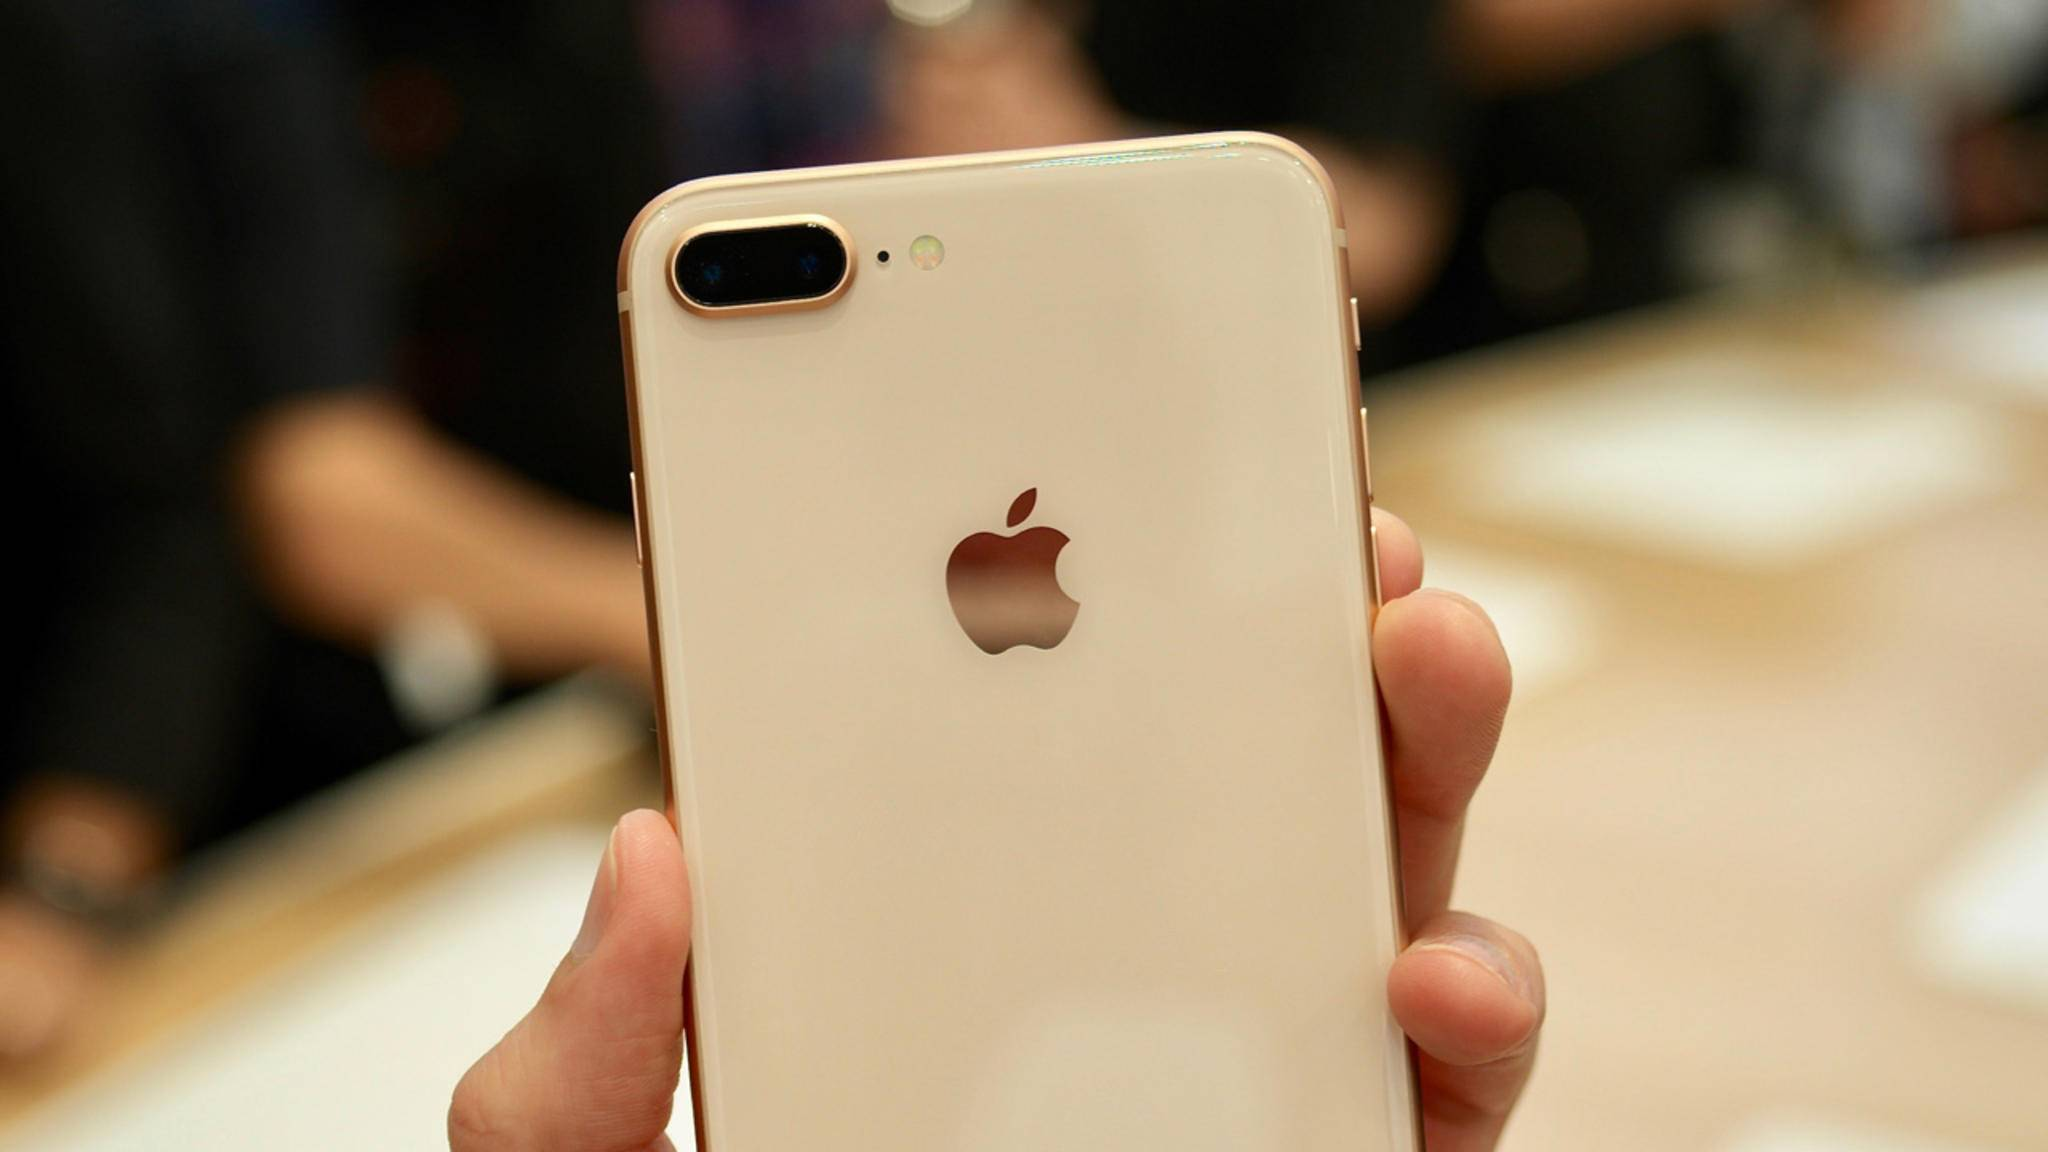 Das iPhone 8 Plus hält an der horizontalen Anordnung der Kameralinsen fest.